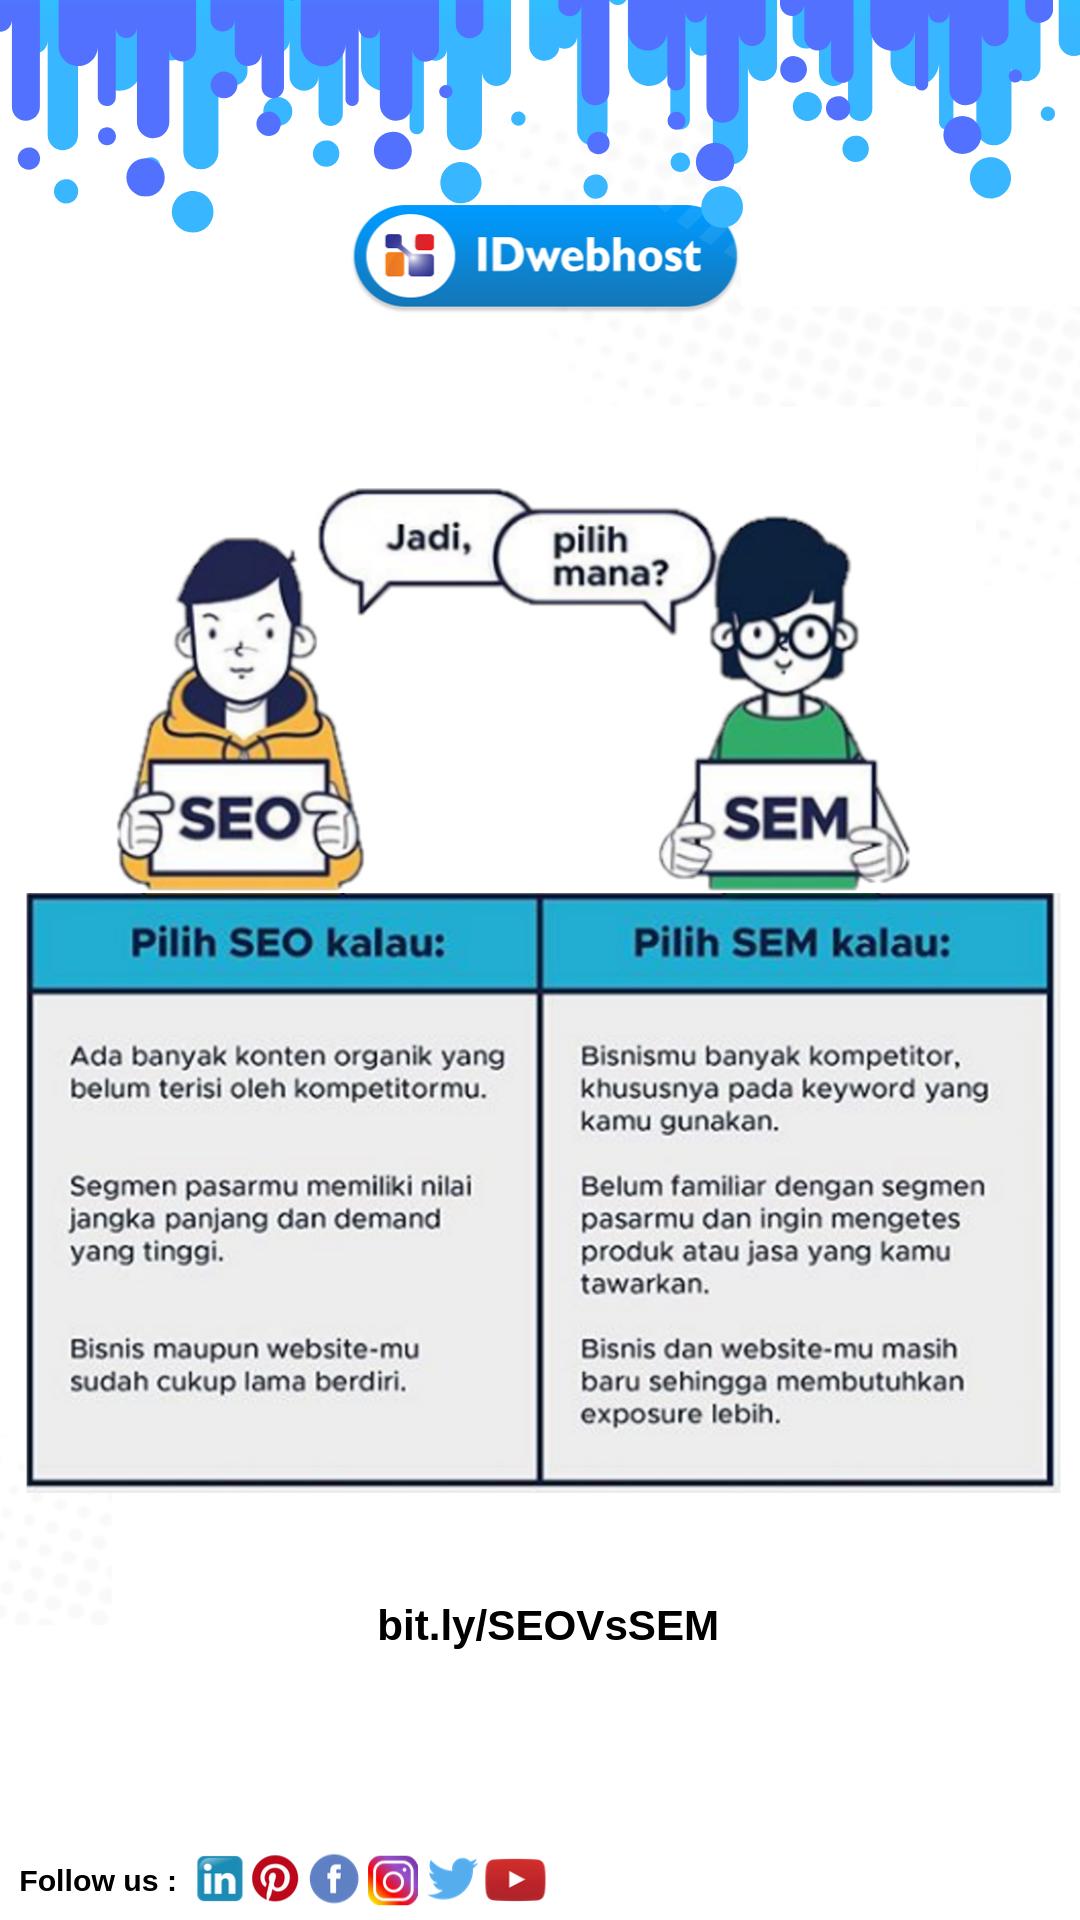 Perbedaan Dan Manfaat Dari Sem Dan Seo Idwebhost Sahabat Marketing Website